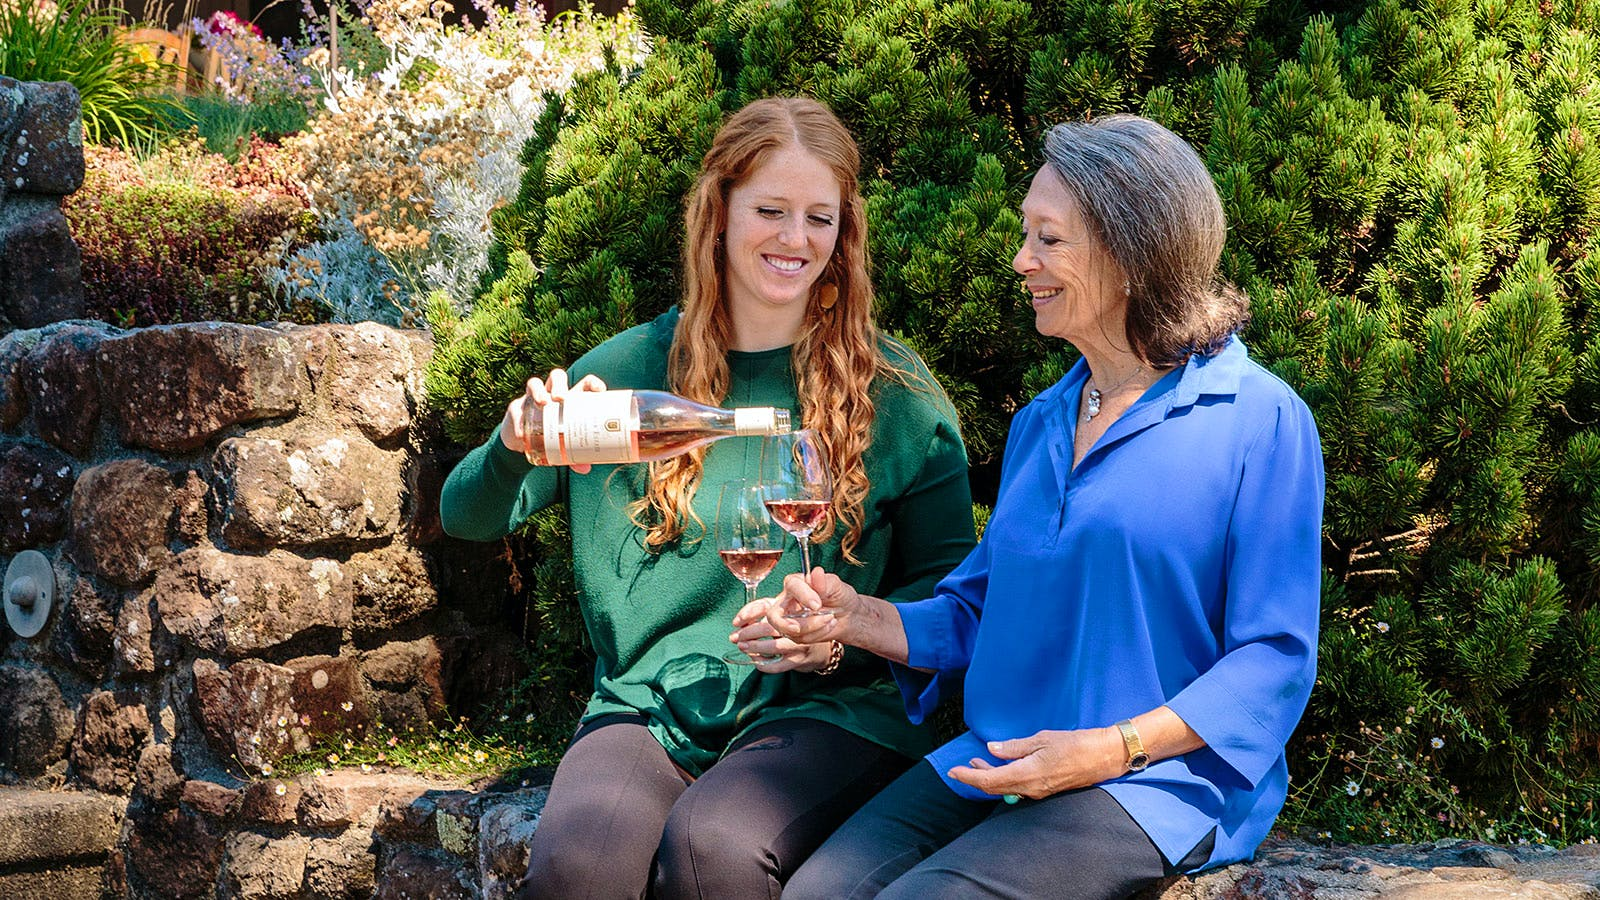 Sommelier Roundtable: Favorite Female-Powered Wines